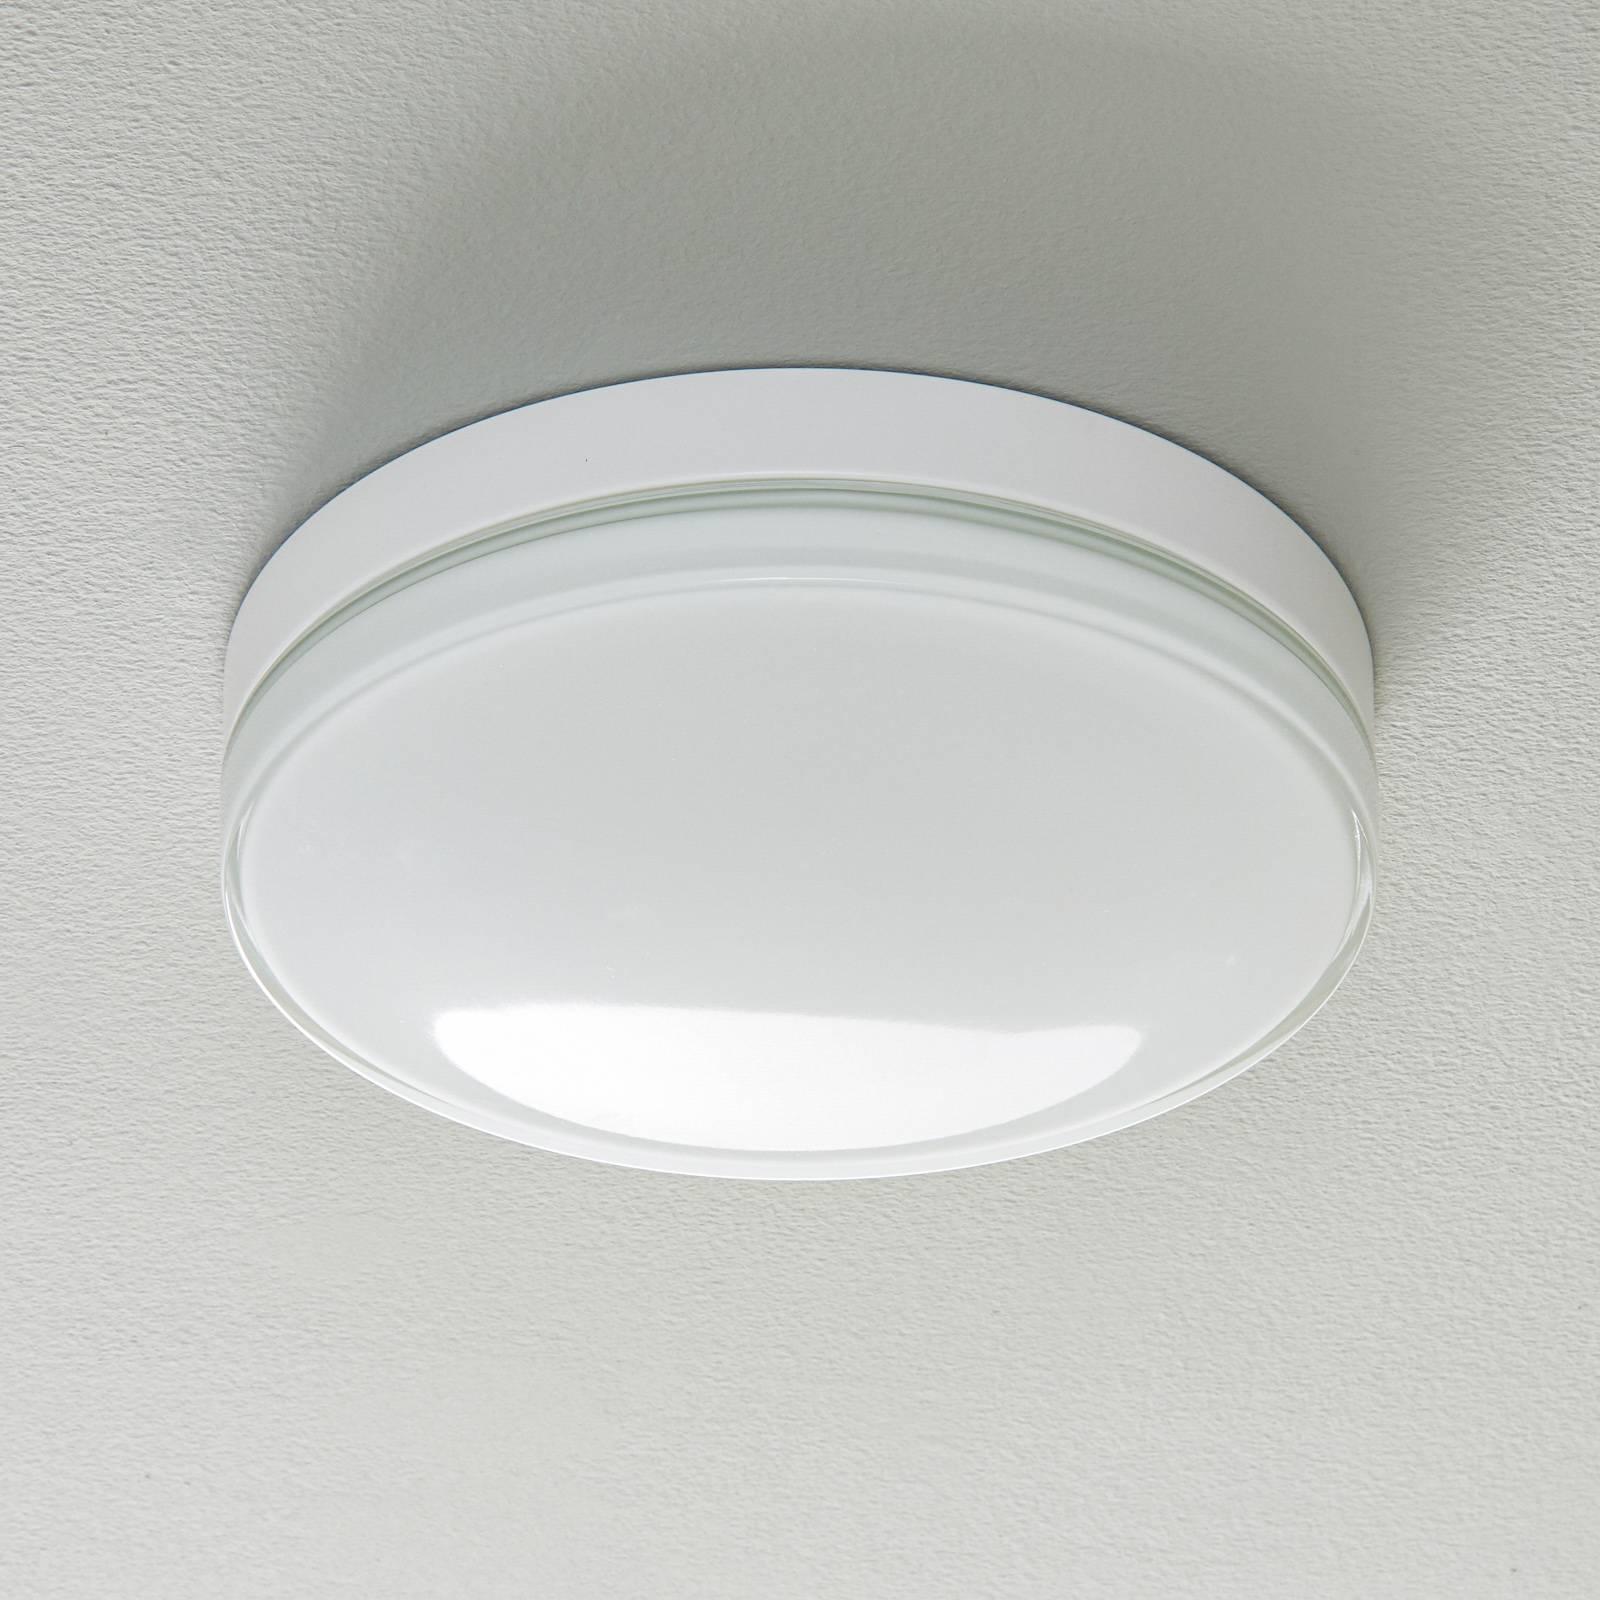 BEGA 12128 LED-kattovalaisin 930 valkoinen 30,5cm